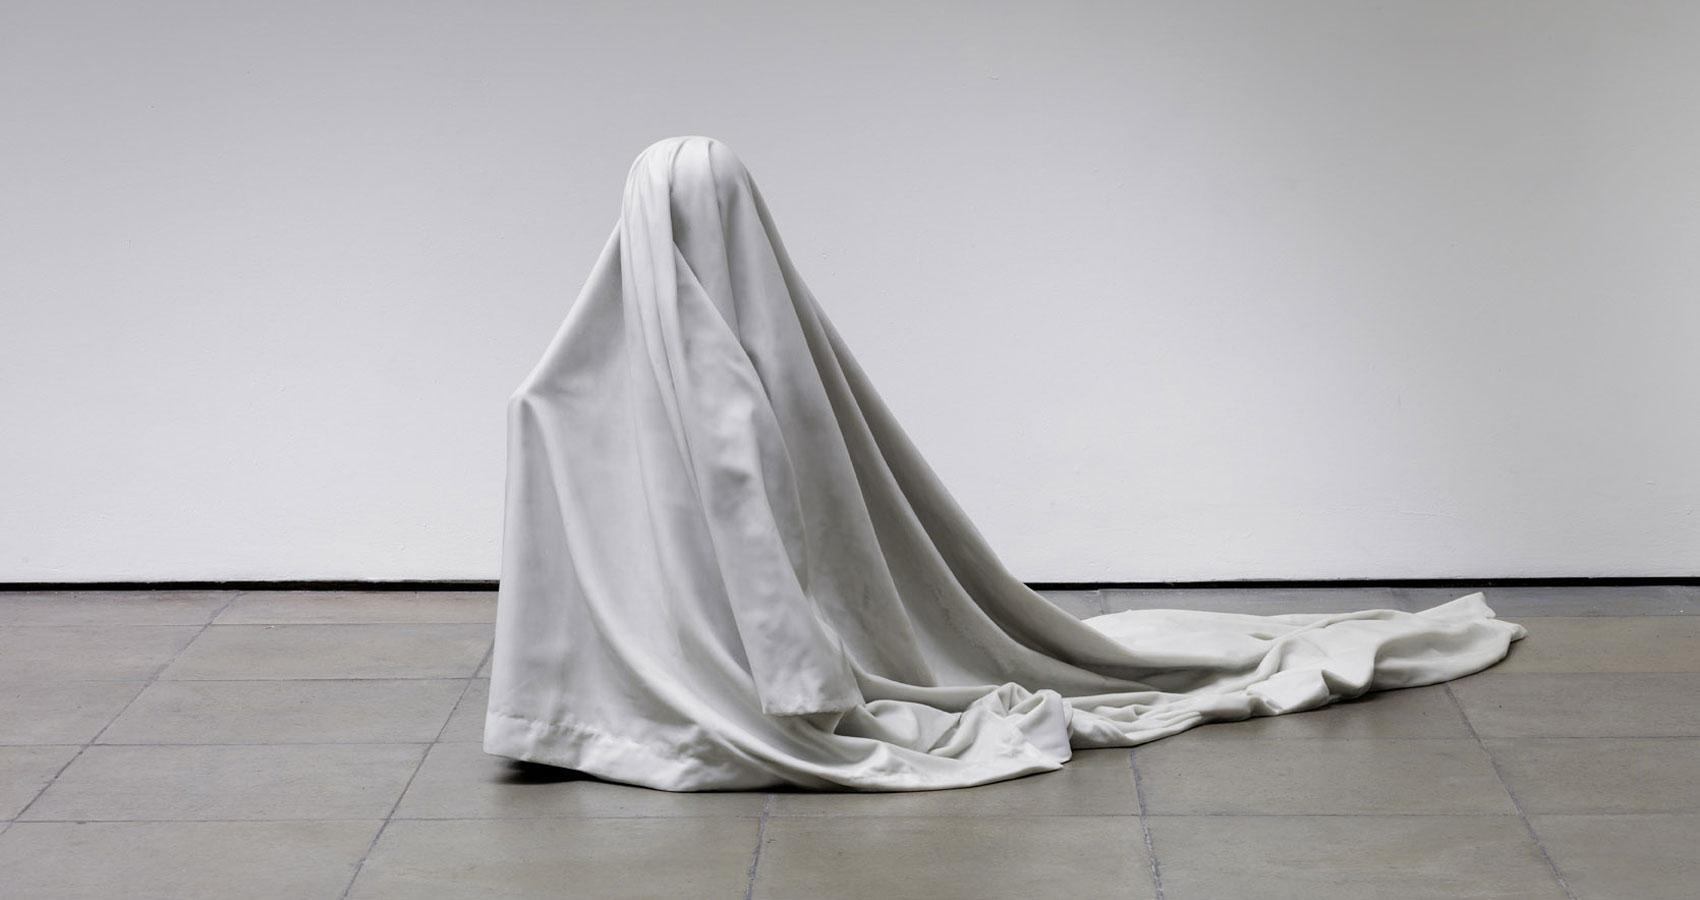 (Ghosts) written by ilex fenusova at Spillwords.com